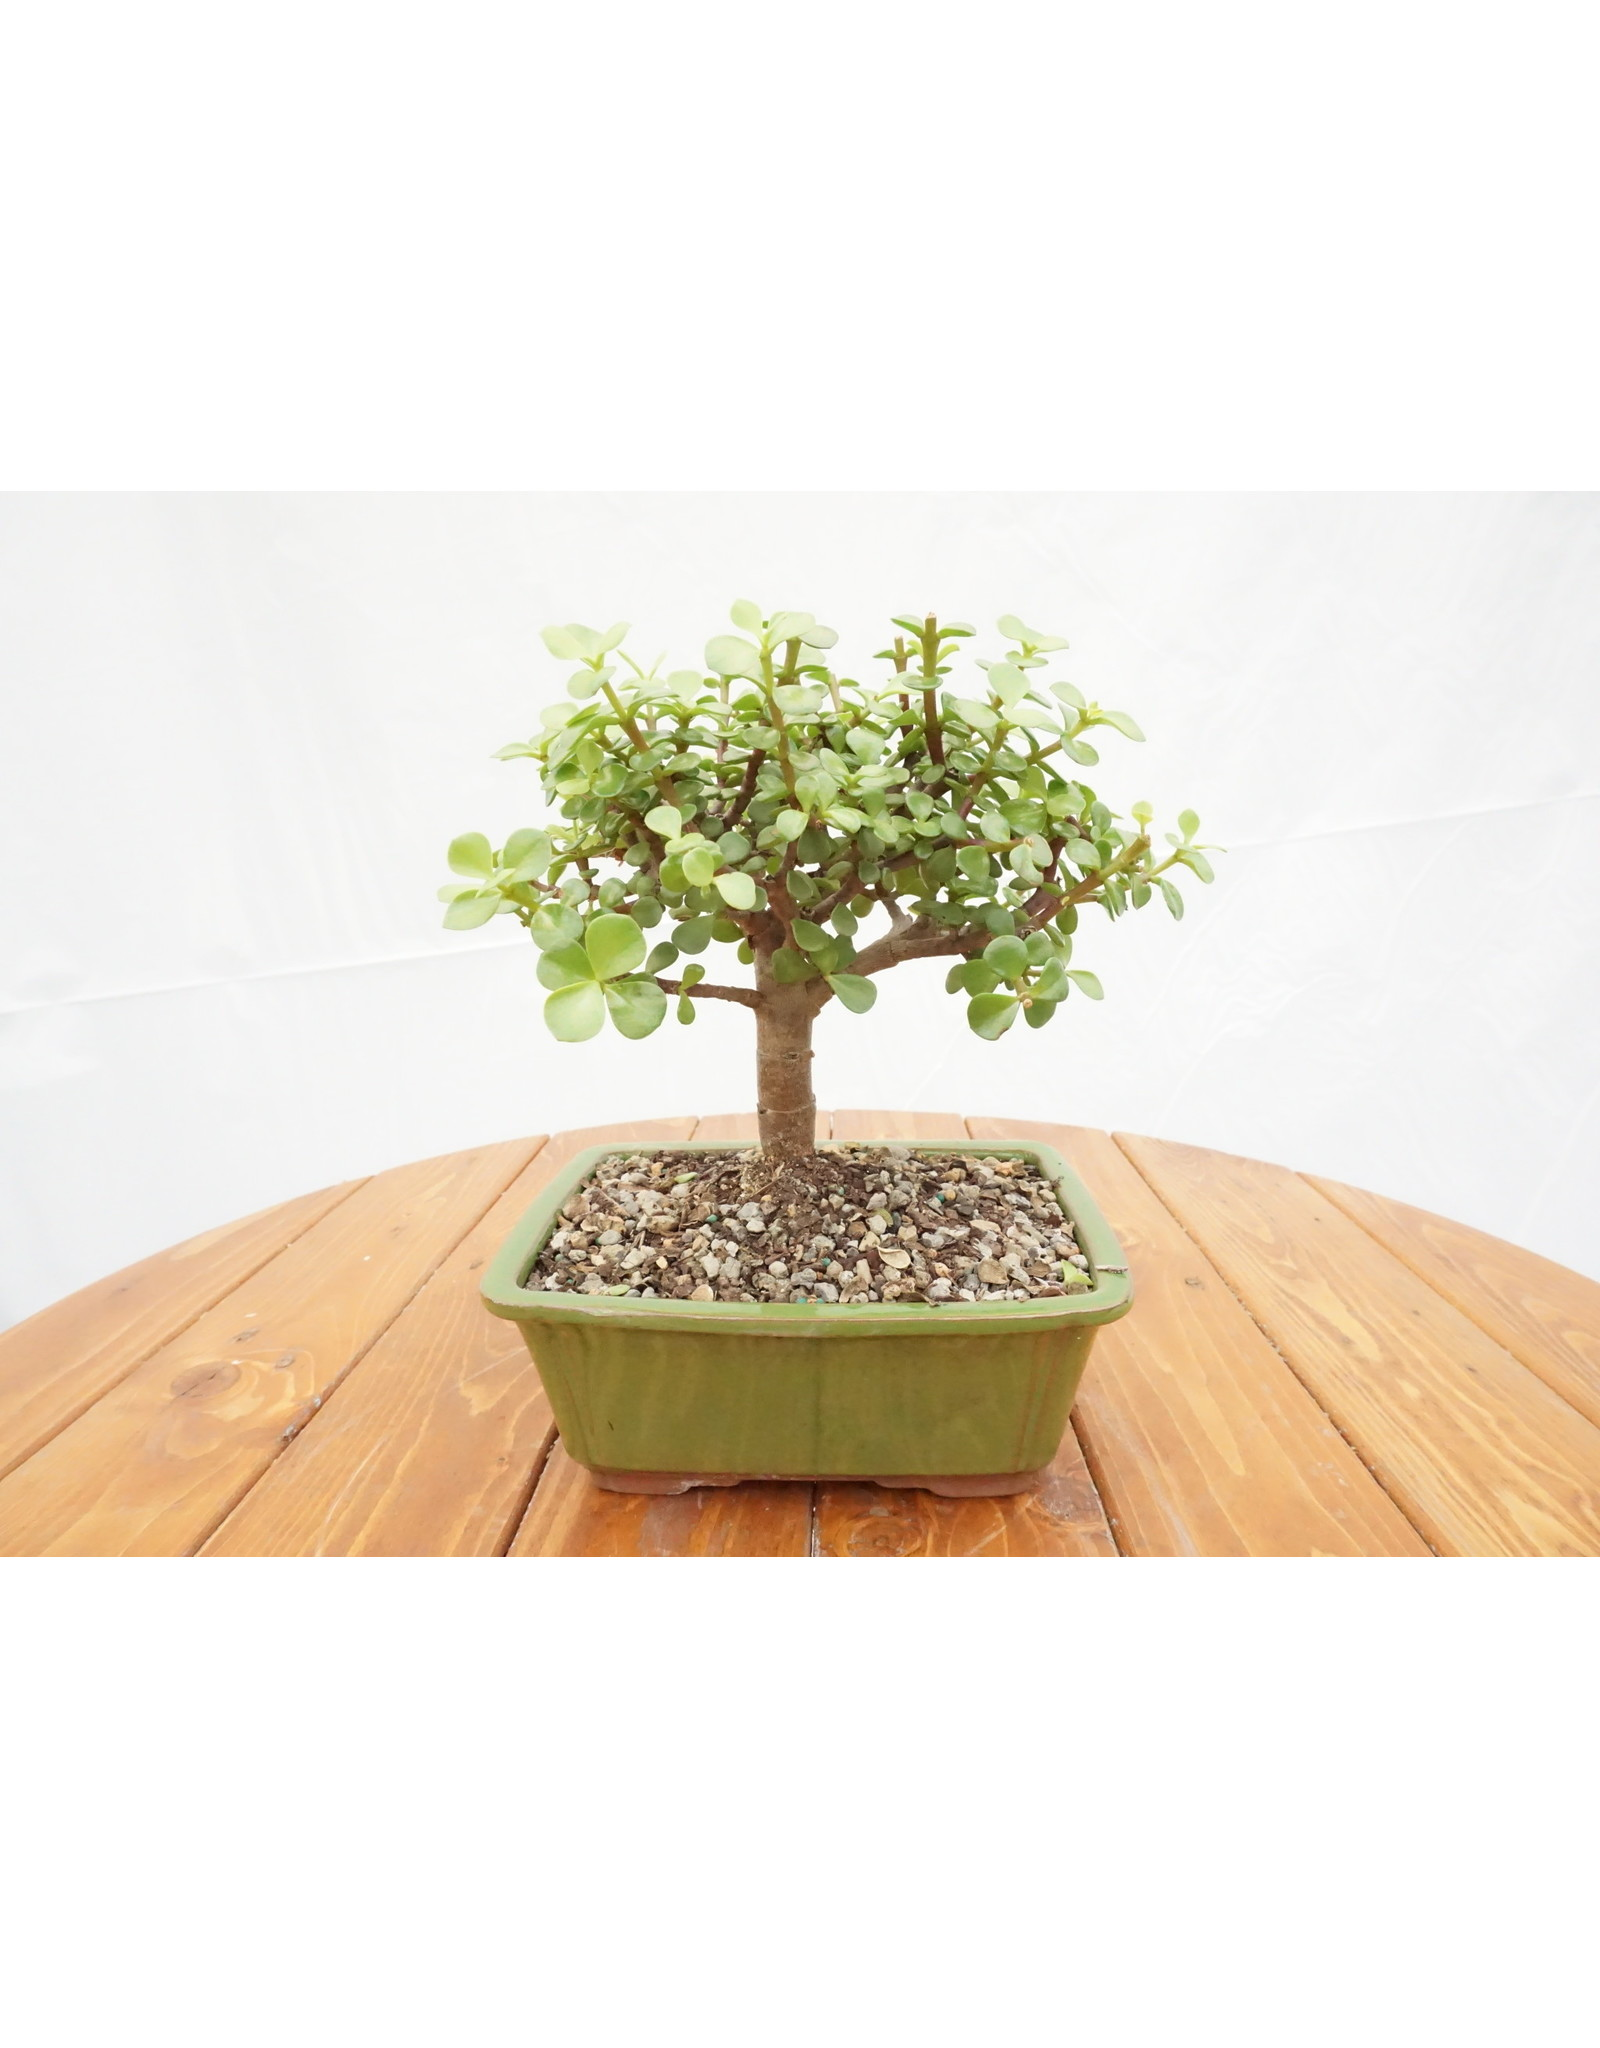 Bonsai, Dwarf Jade - Crassula Ovata